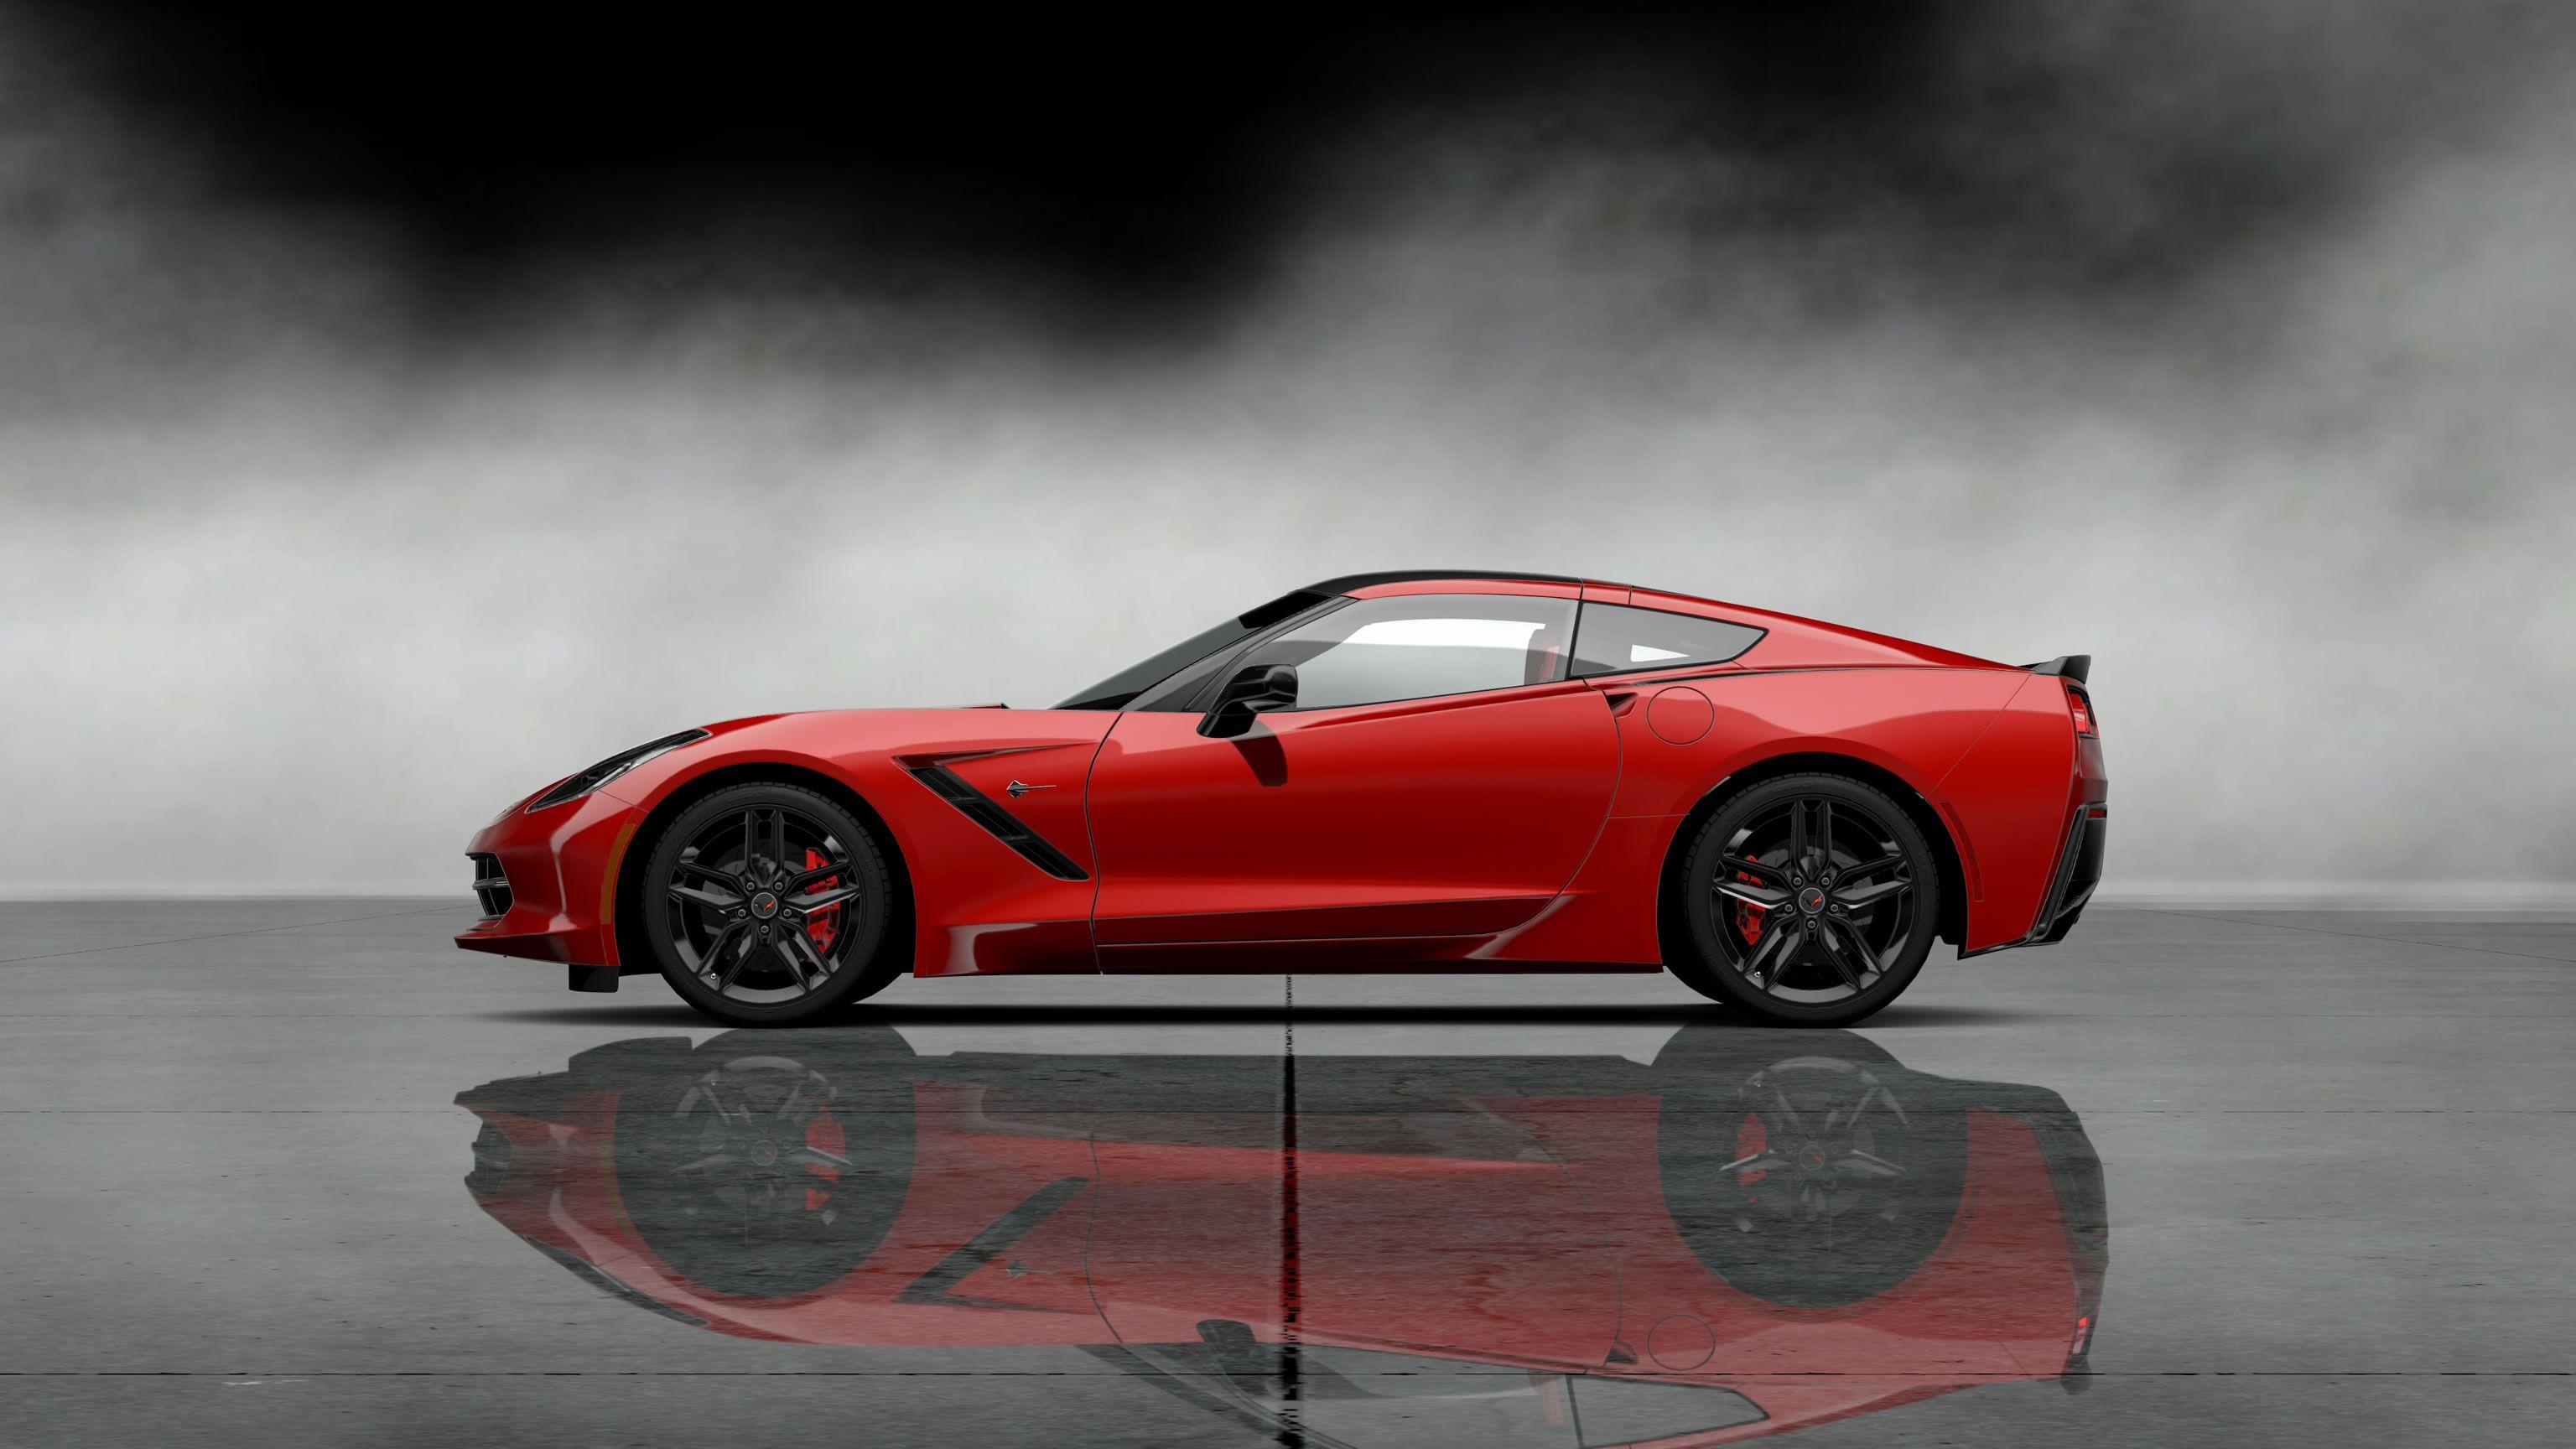 2014 corvette stingray body style photo